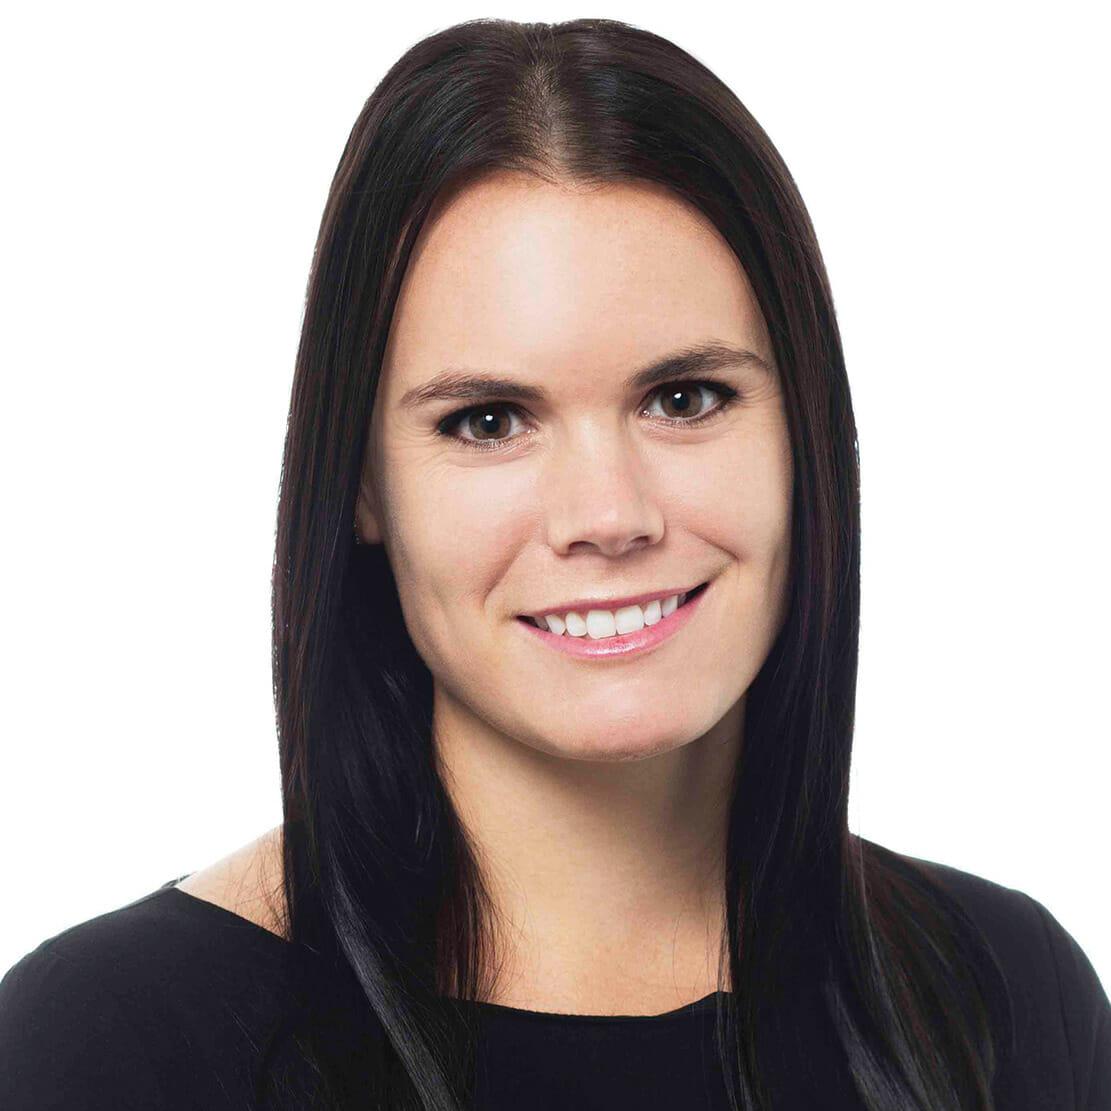 Caroline Bergin